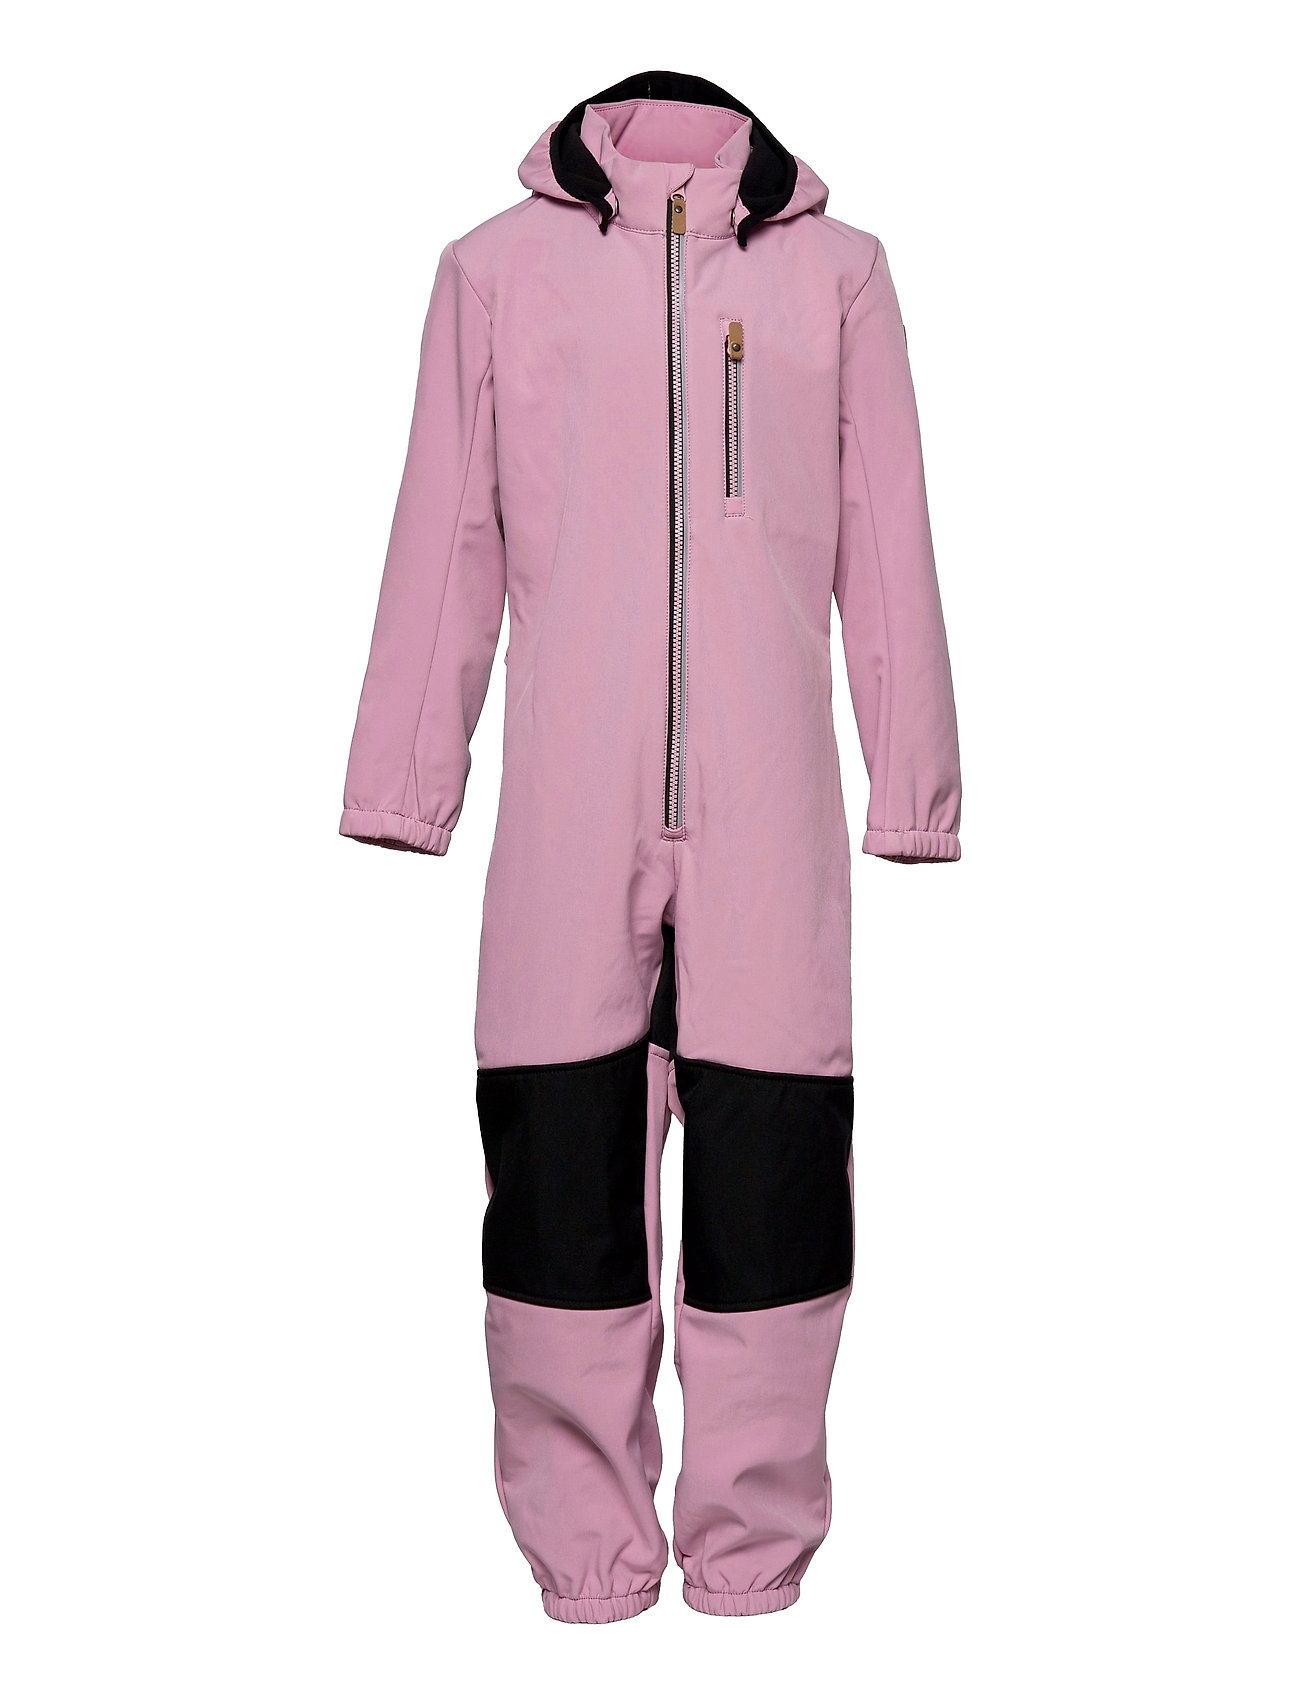 Nurmes Outerwear Softshells Softshell Sets & Suits Lyserød Reima